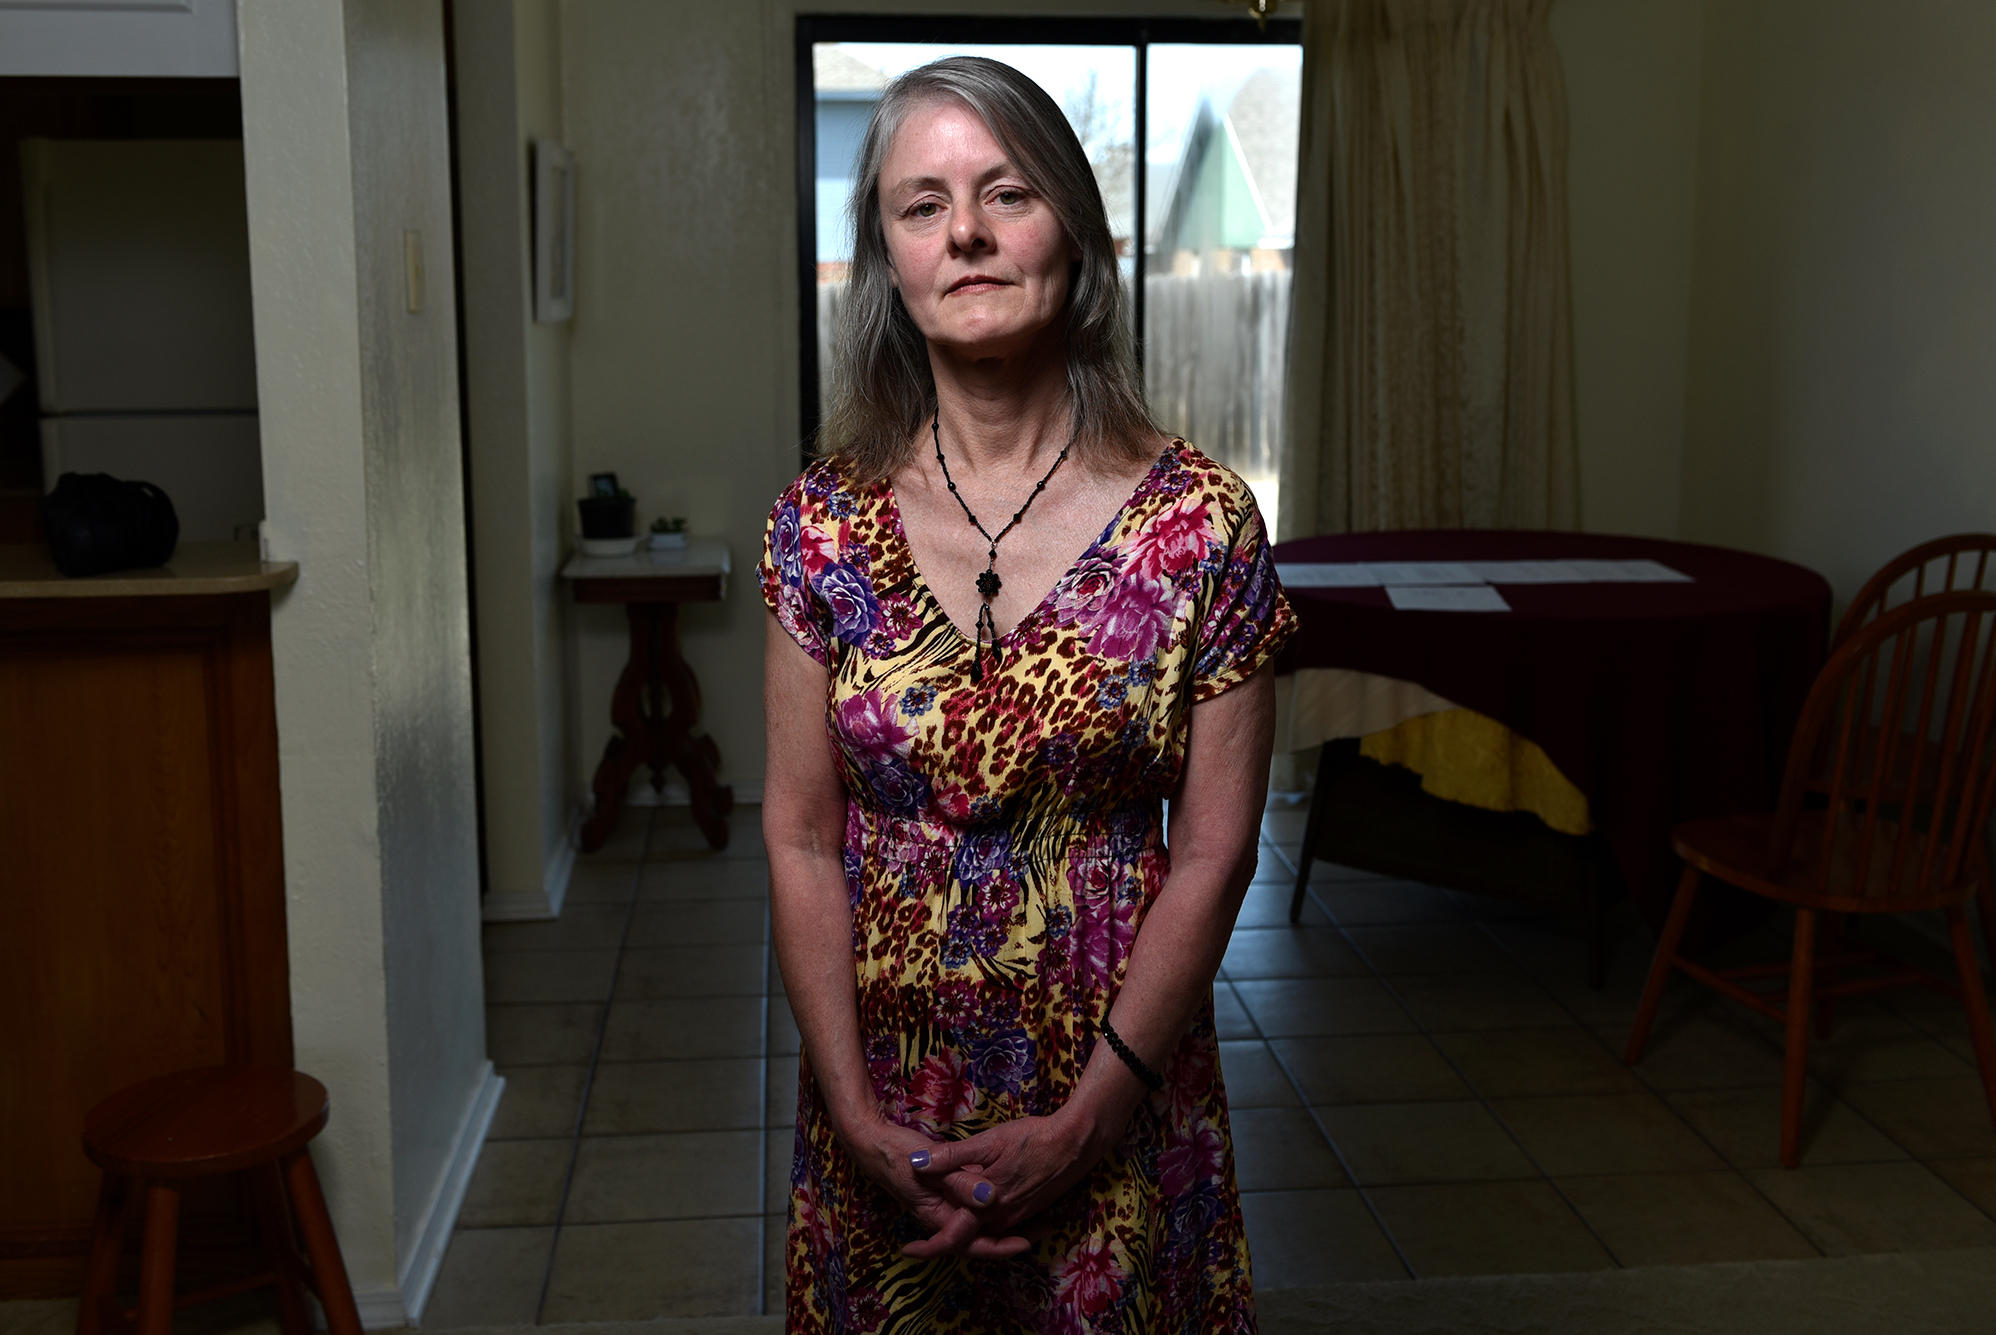 Sticker Shock Jolts Oklahoma Patient: $15,076 For 4 Tiny